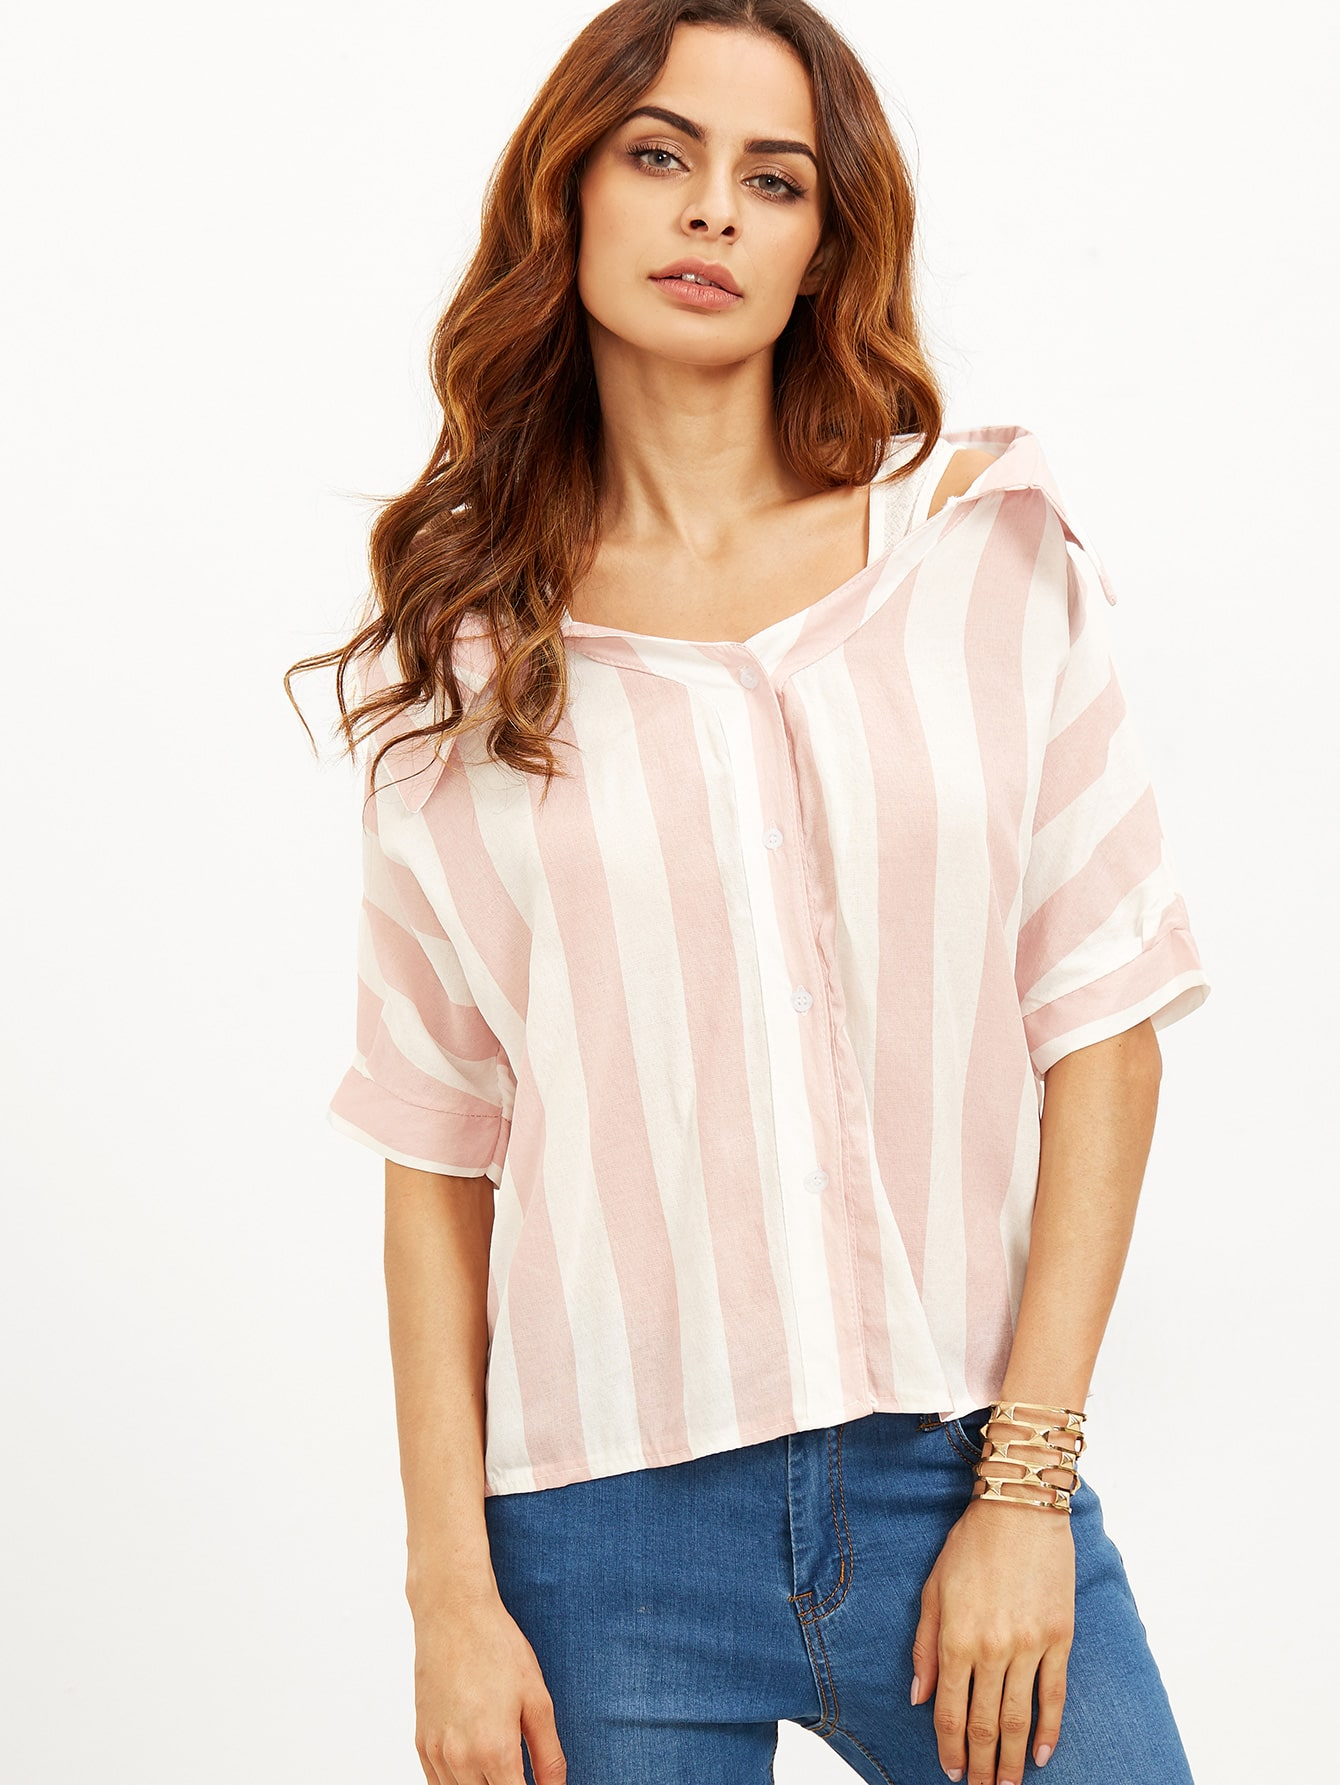 blouse160802139_2